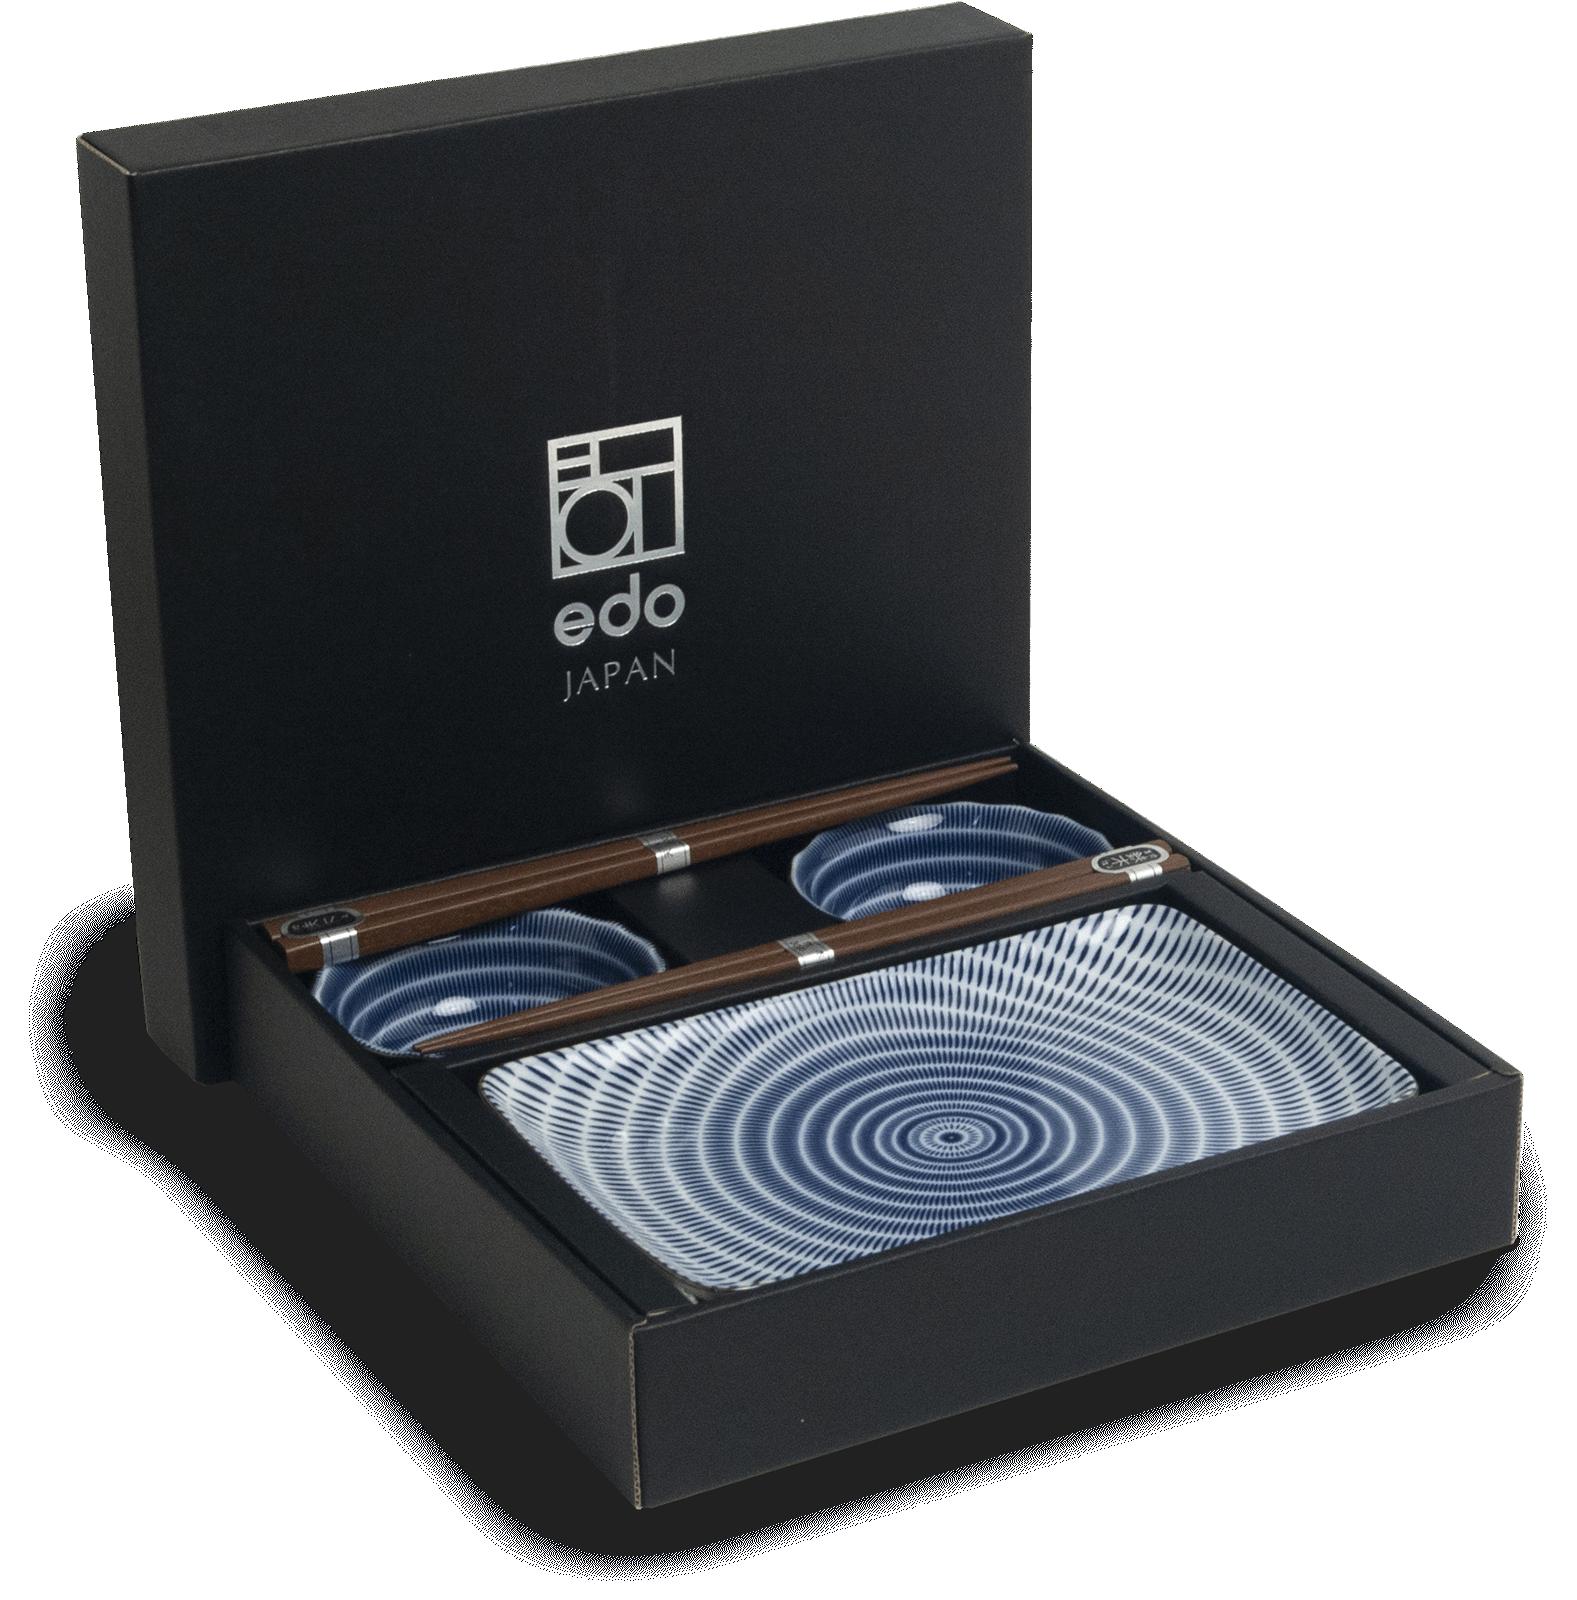 Edo Japan   Edo Japan   TOKUSA   Authentic 6-piece Sushi Dinnerware Set   In Giftbox